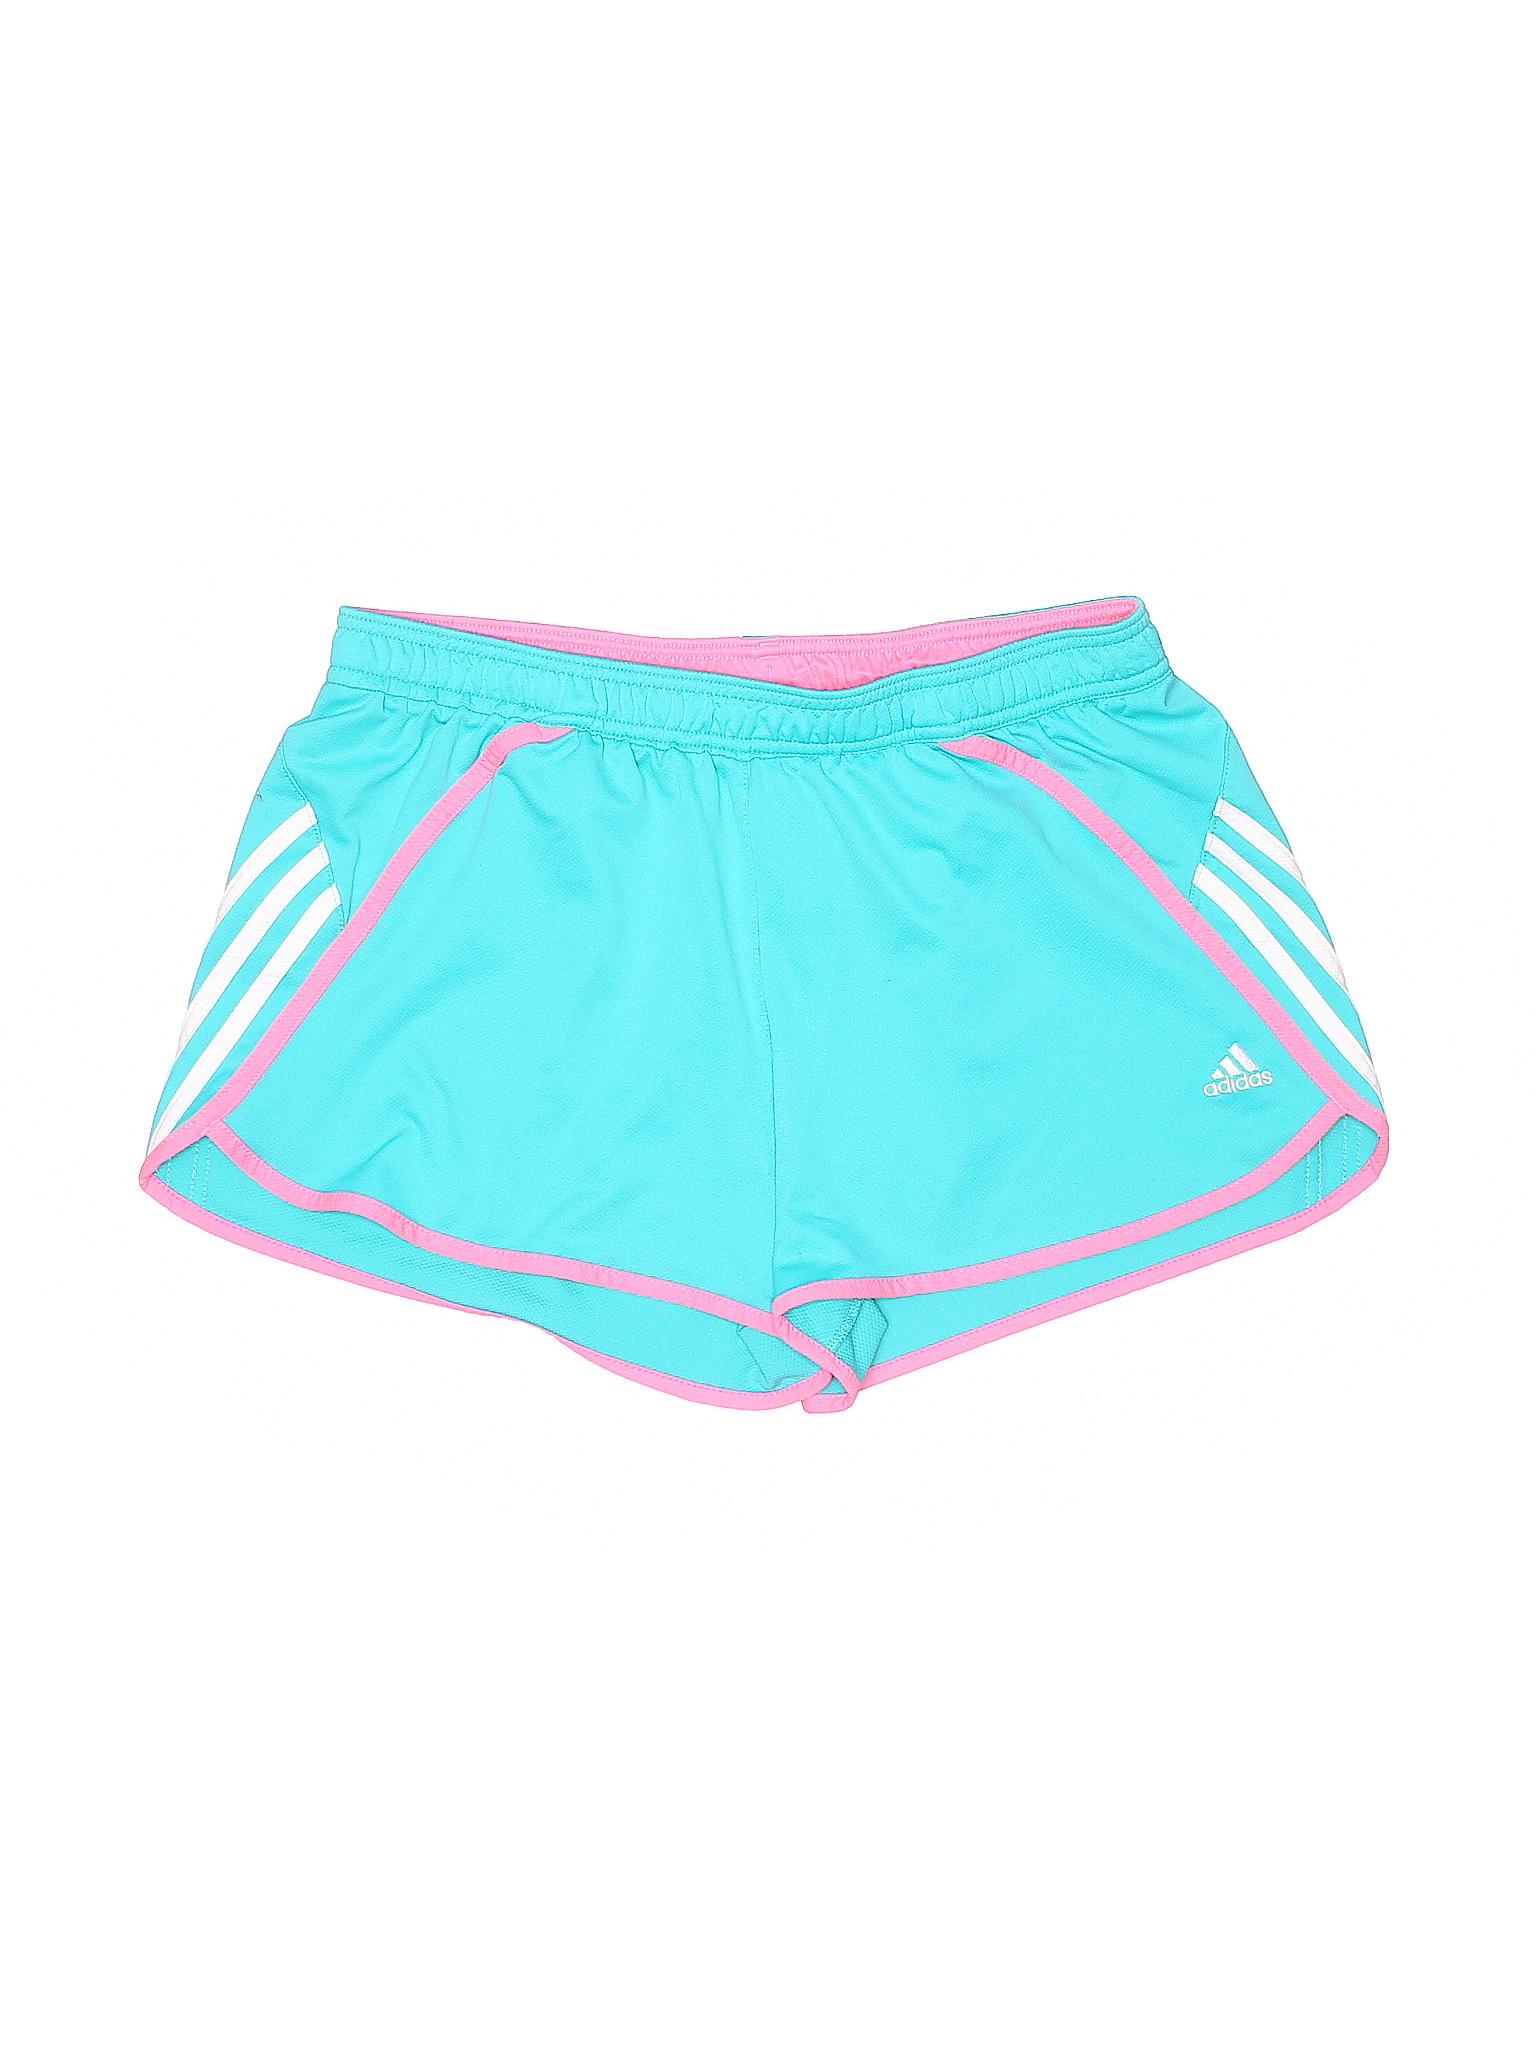 Adidas Shorts Boutique Adidas Athletic Boutique Athletic vwp7tpz